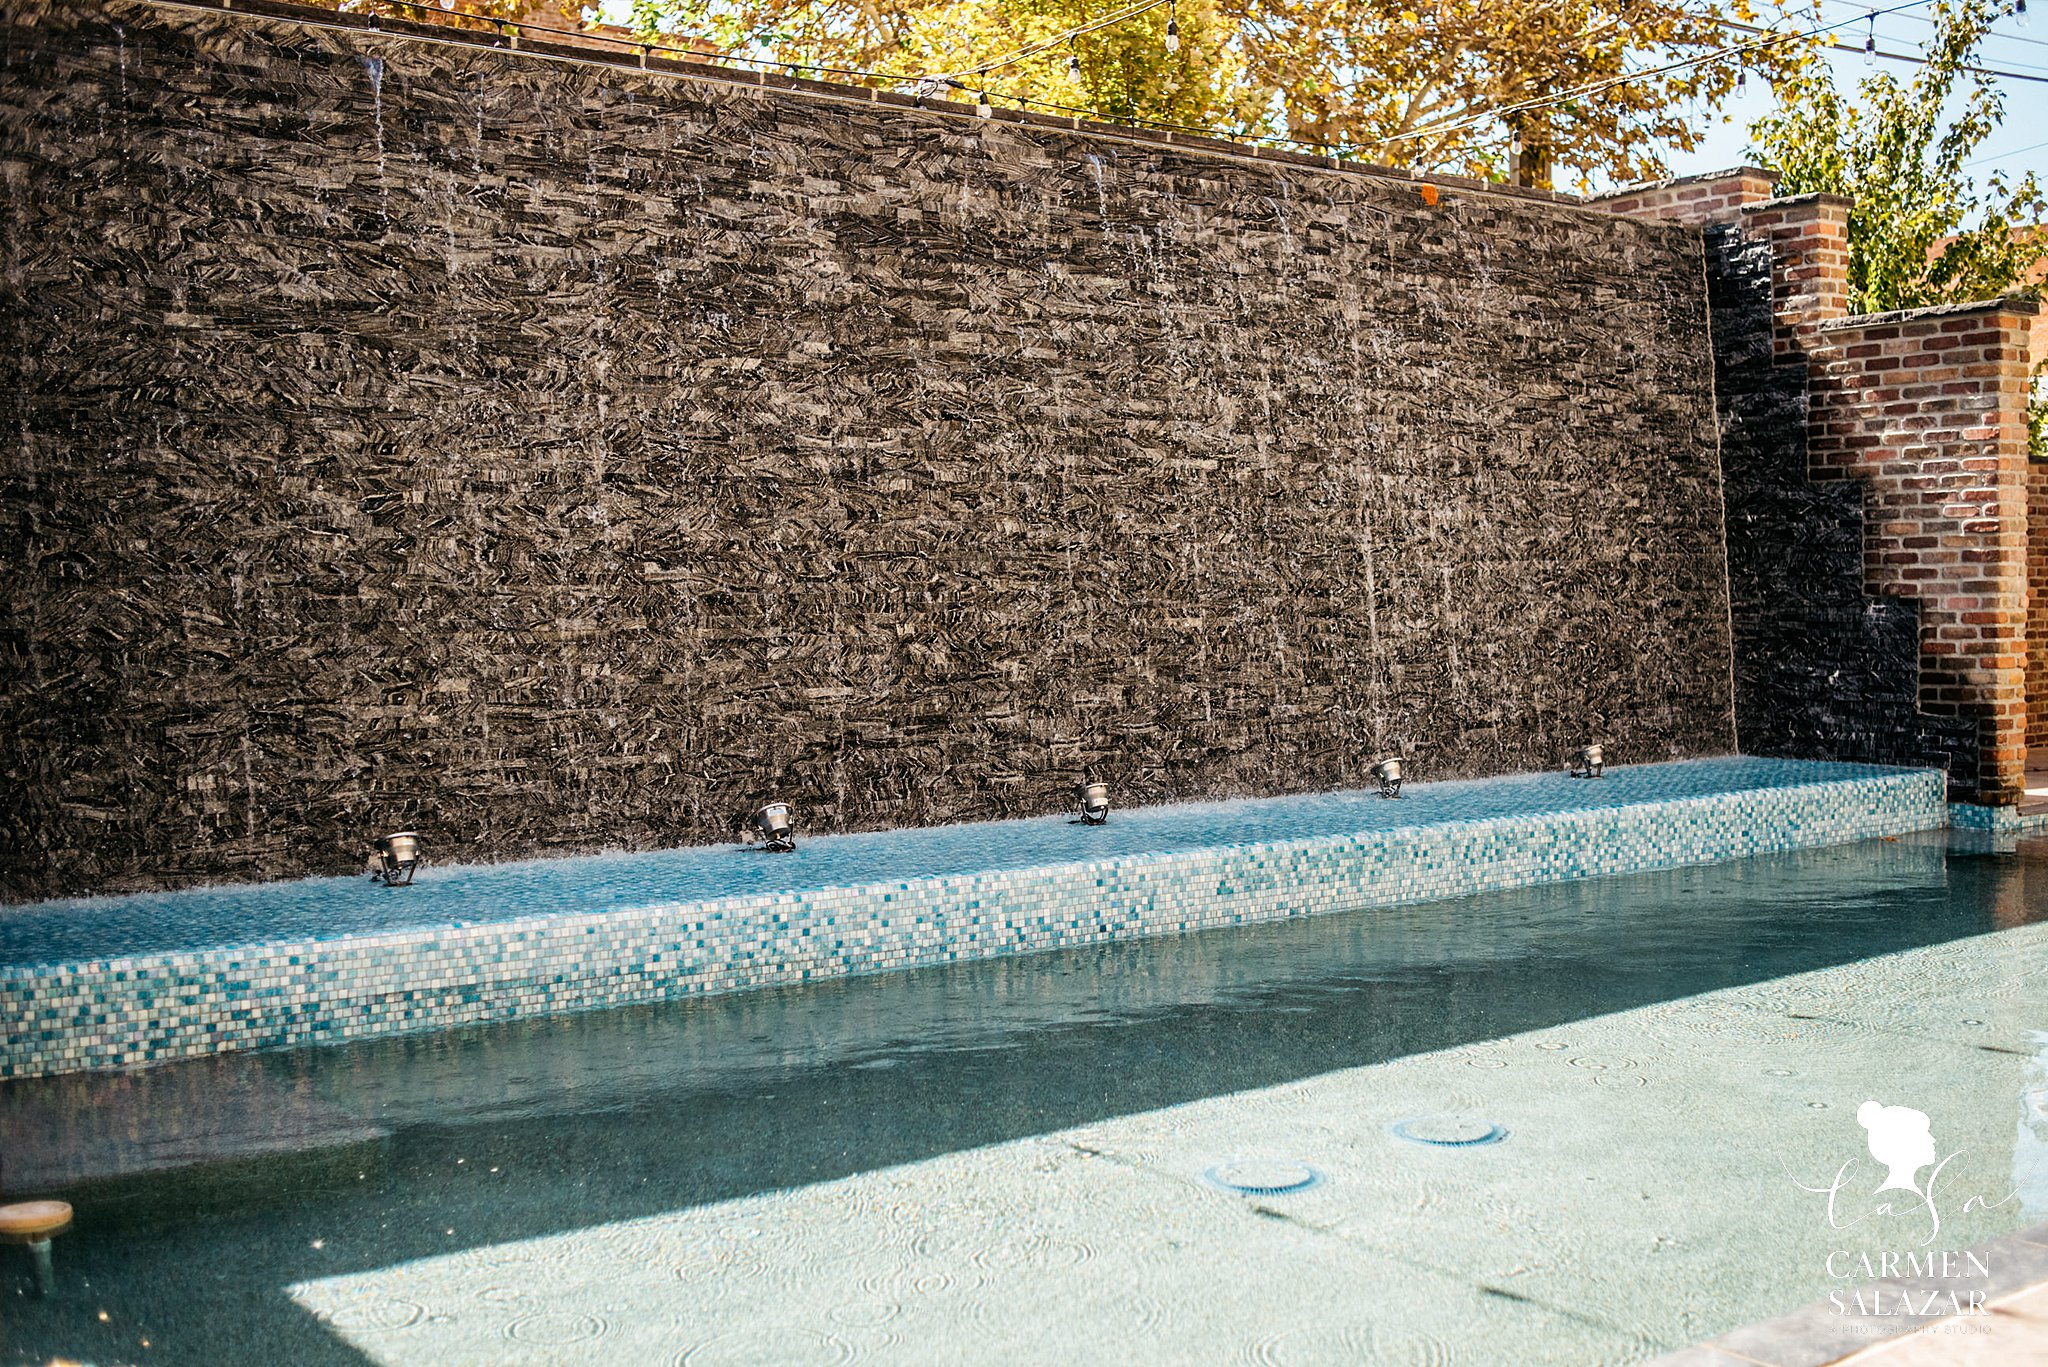 Hotel Winters swimming pool